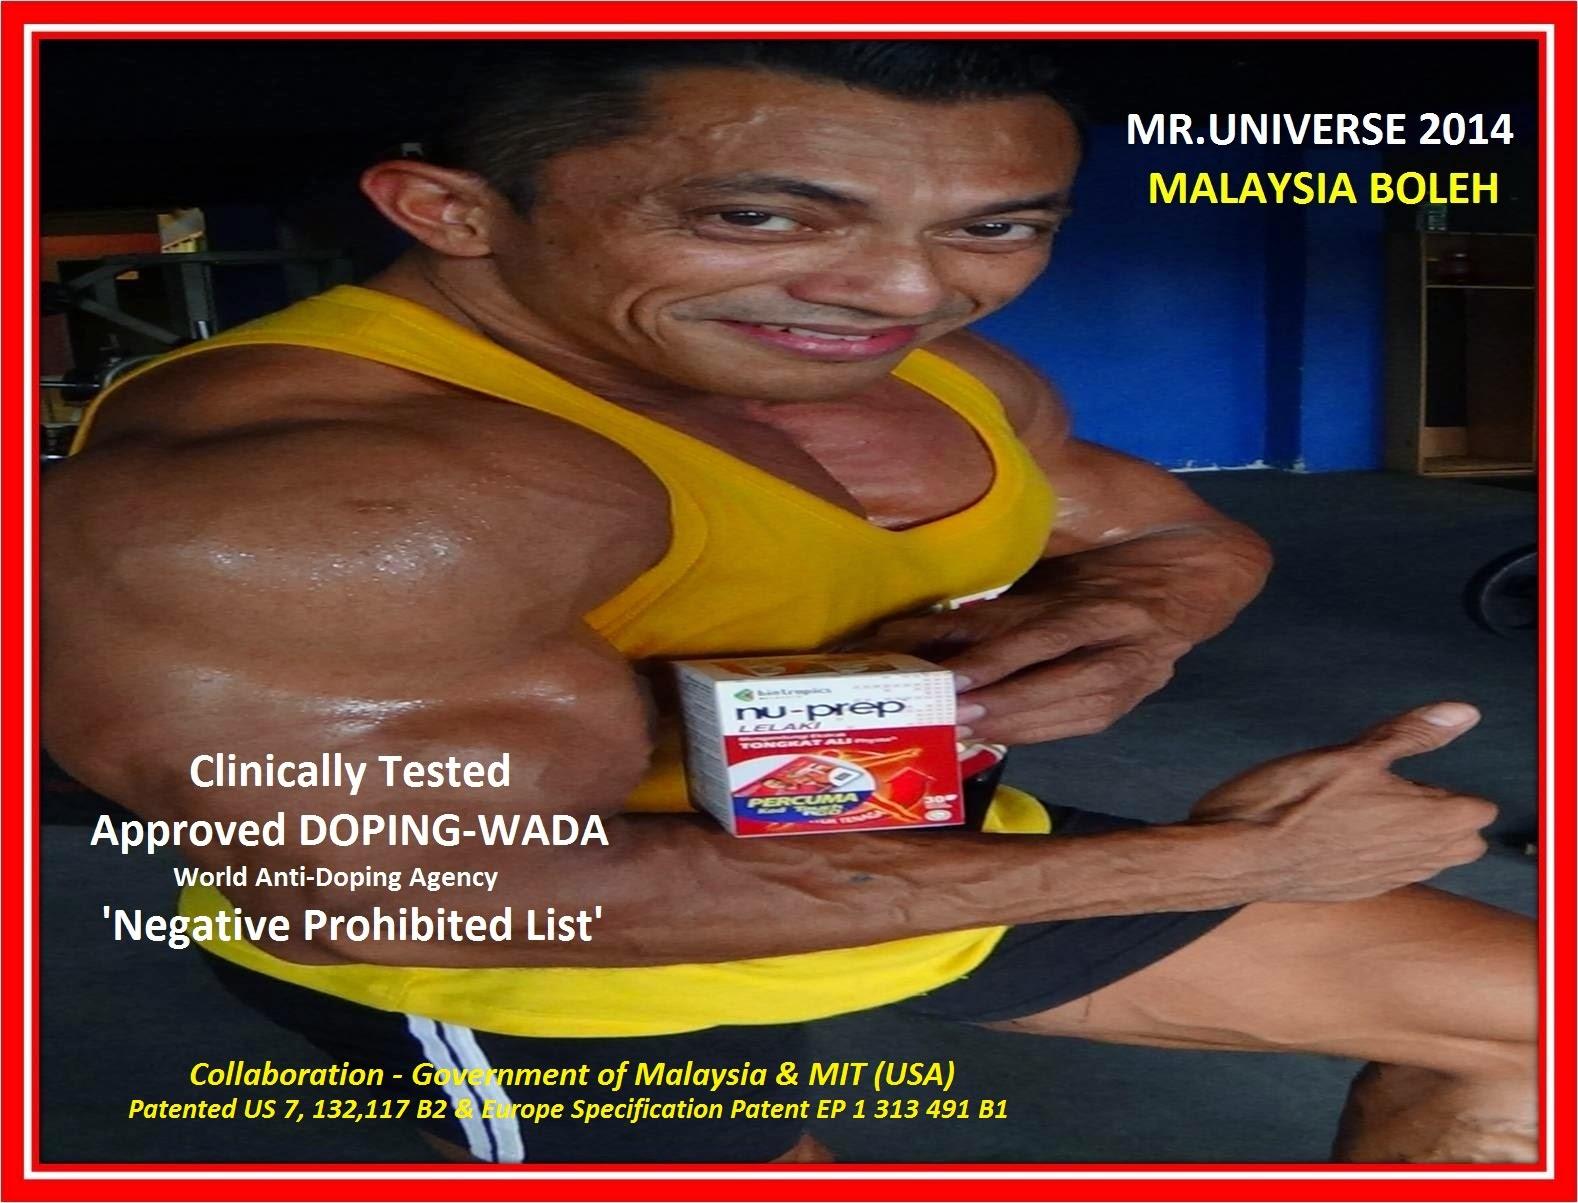 Nu-Prep lelaki. Approved DOPING-WADA 'World Anti-Doping Agency'. Negative Prohibited List.